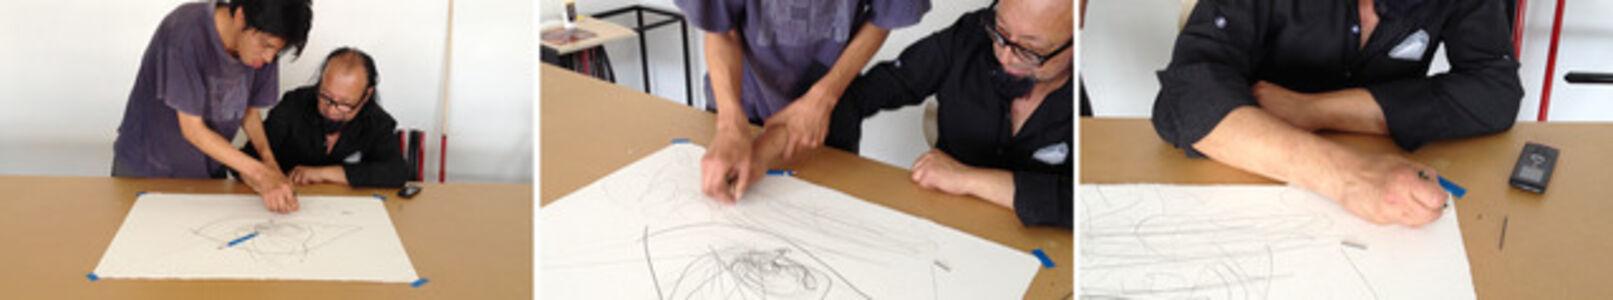 Assited Drawing (Dibujo Asistido)